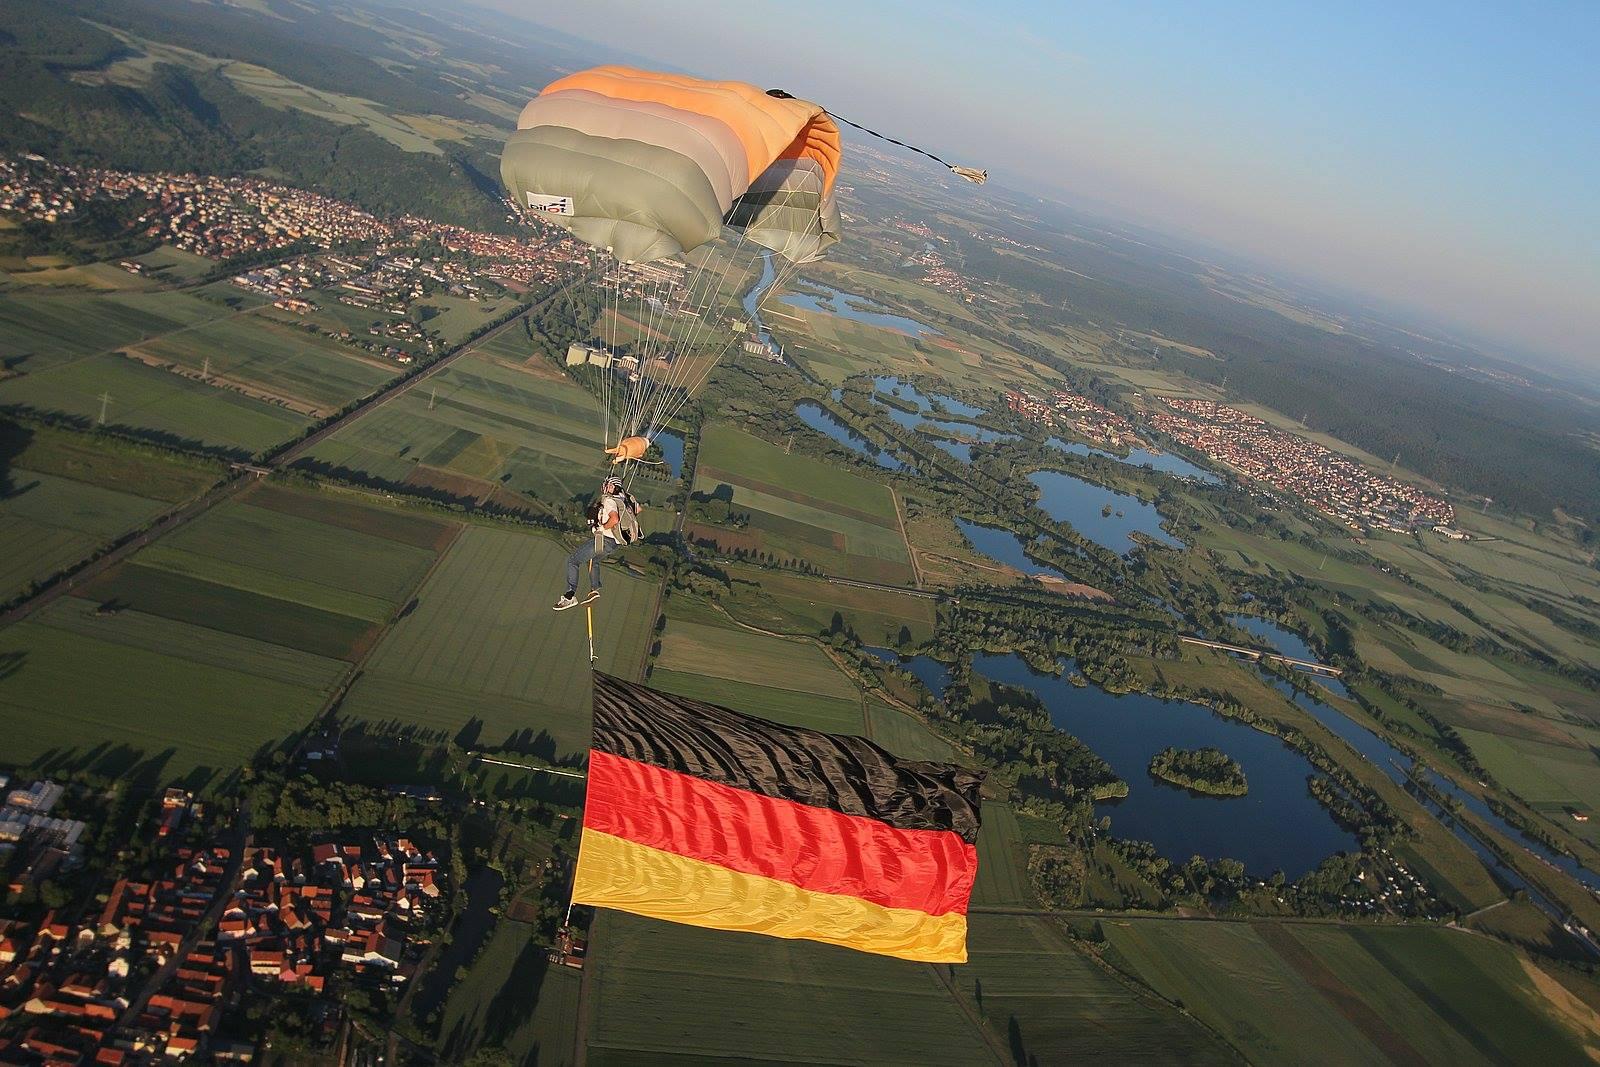 Fallschirmsportzentrum Hassfurt